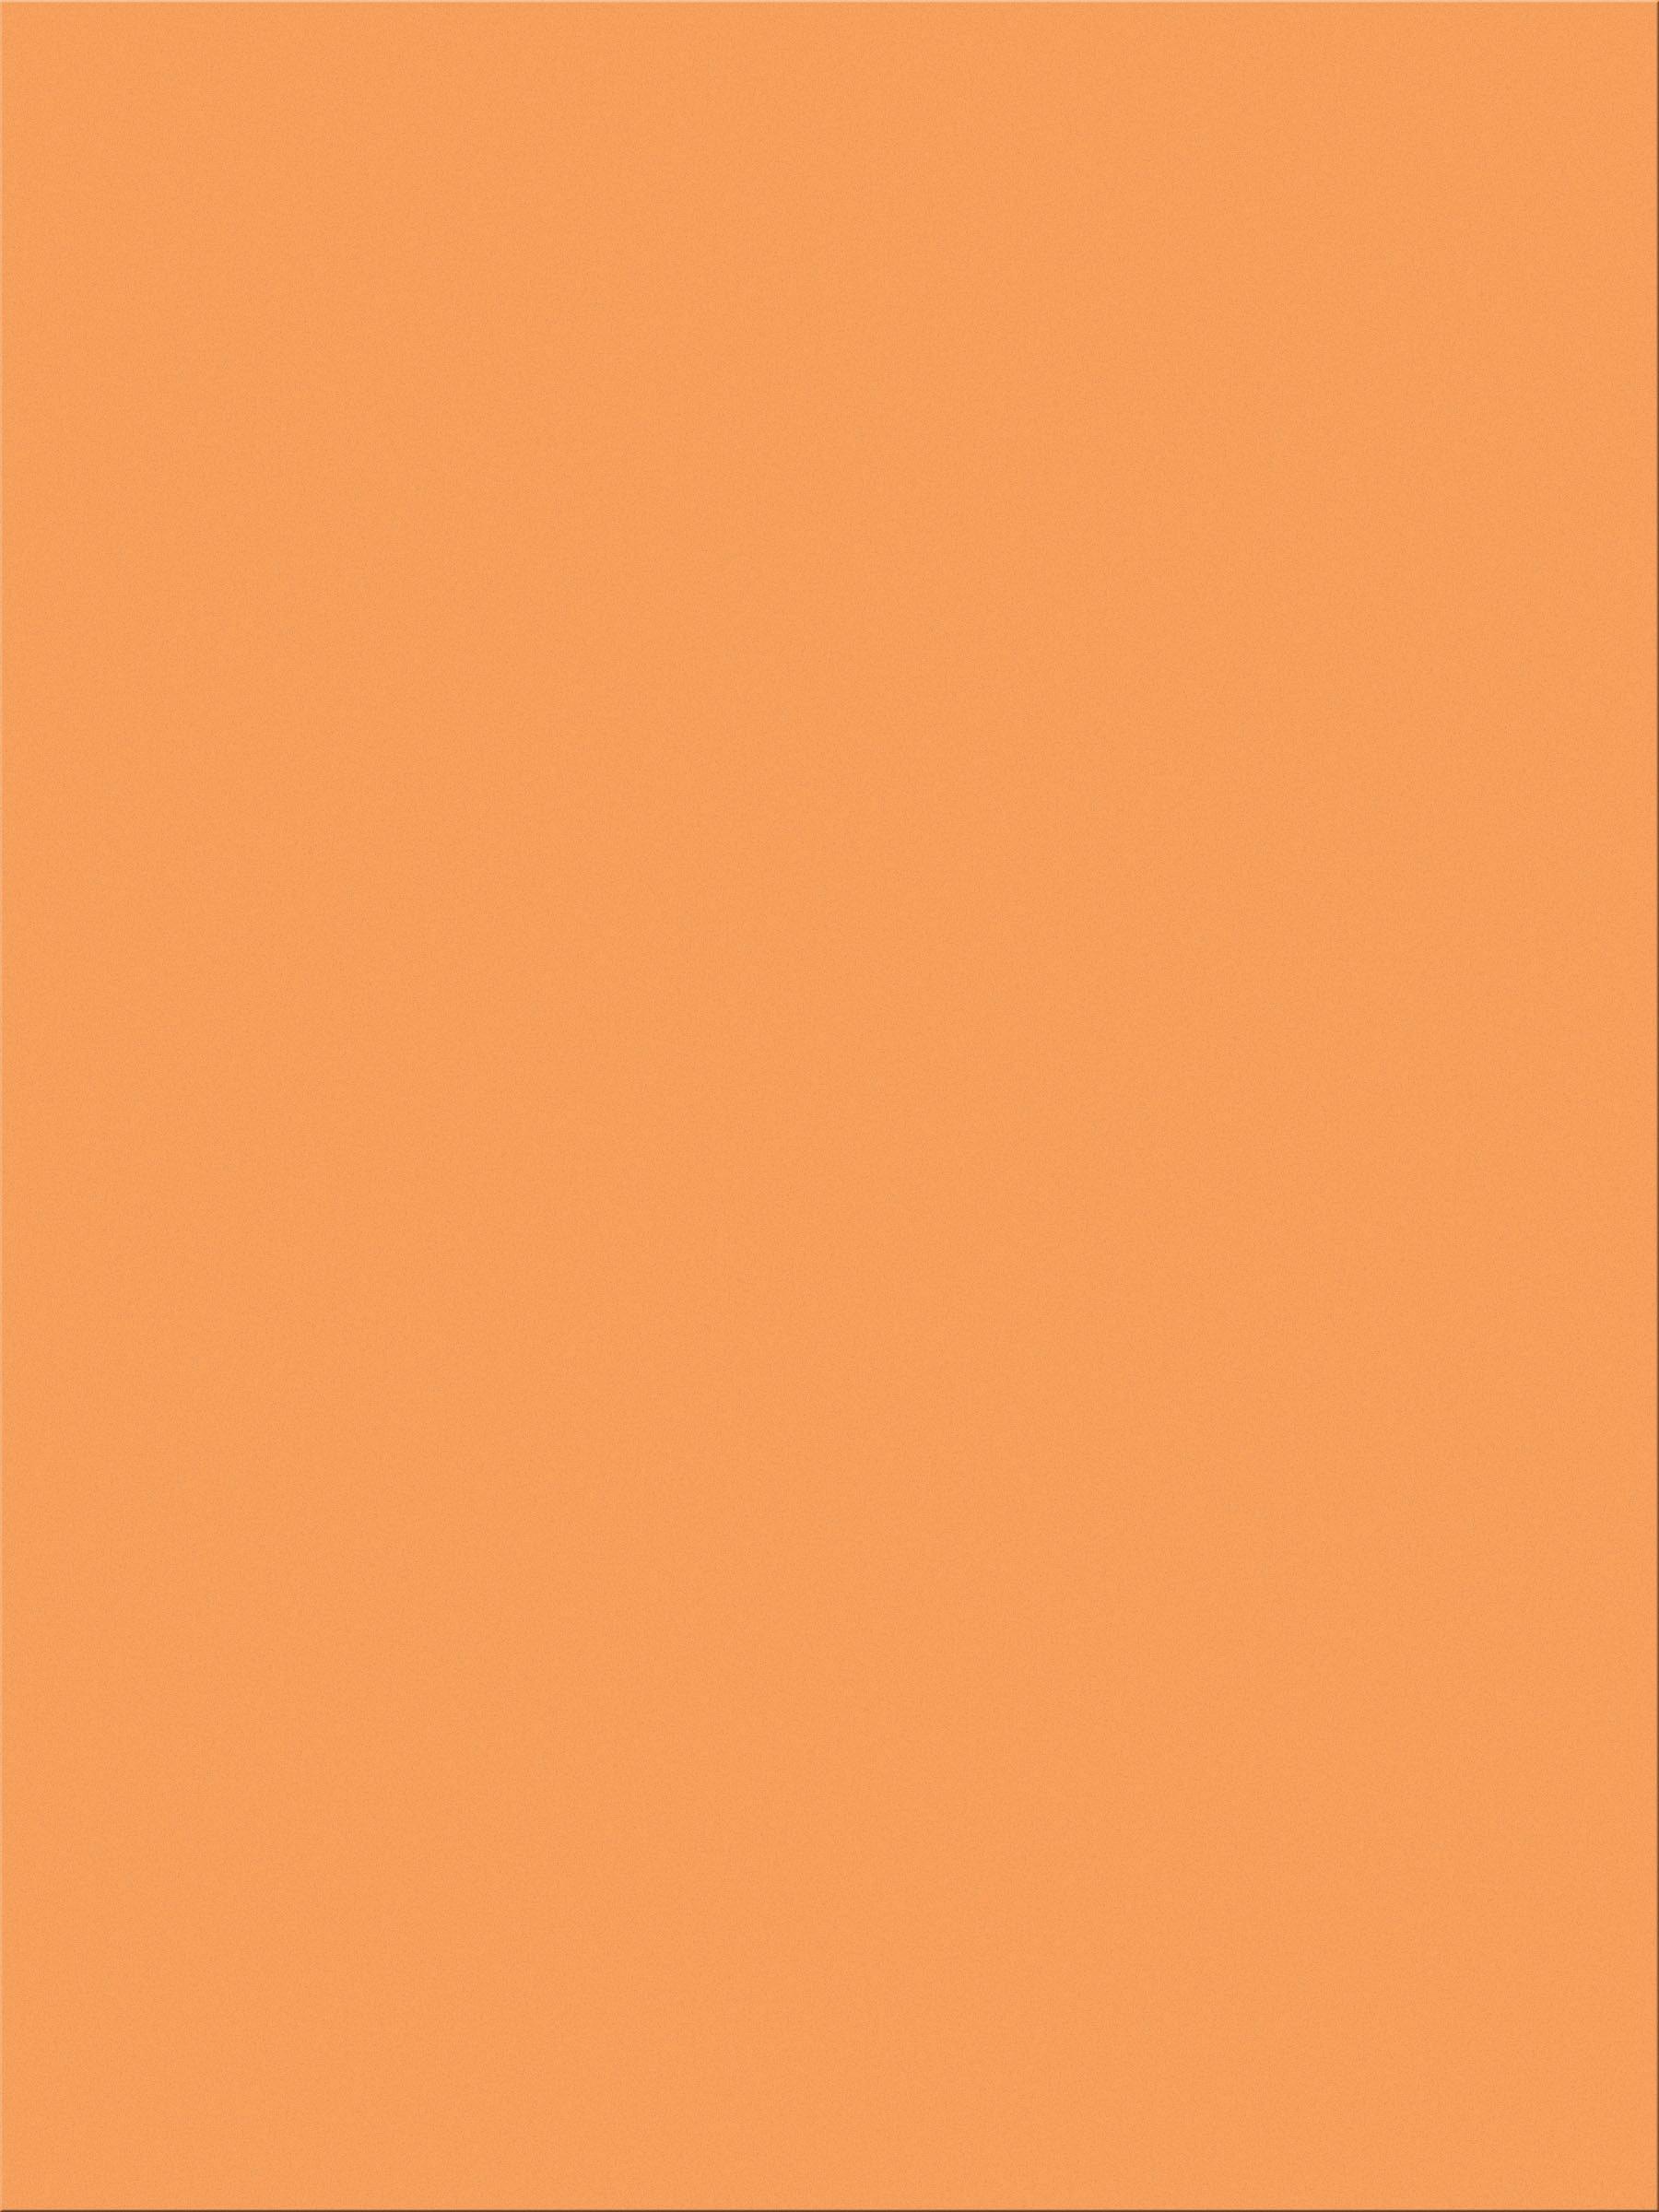 Pacon SunWorks Construction Paper, 9'' x 12'', 100-Count, Yellow Orange (8504)